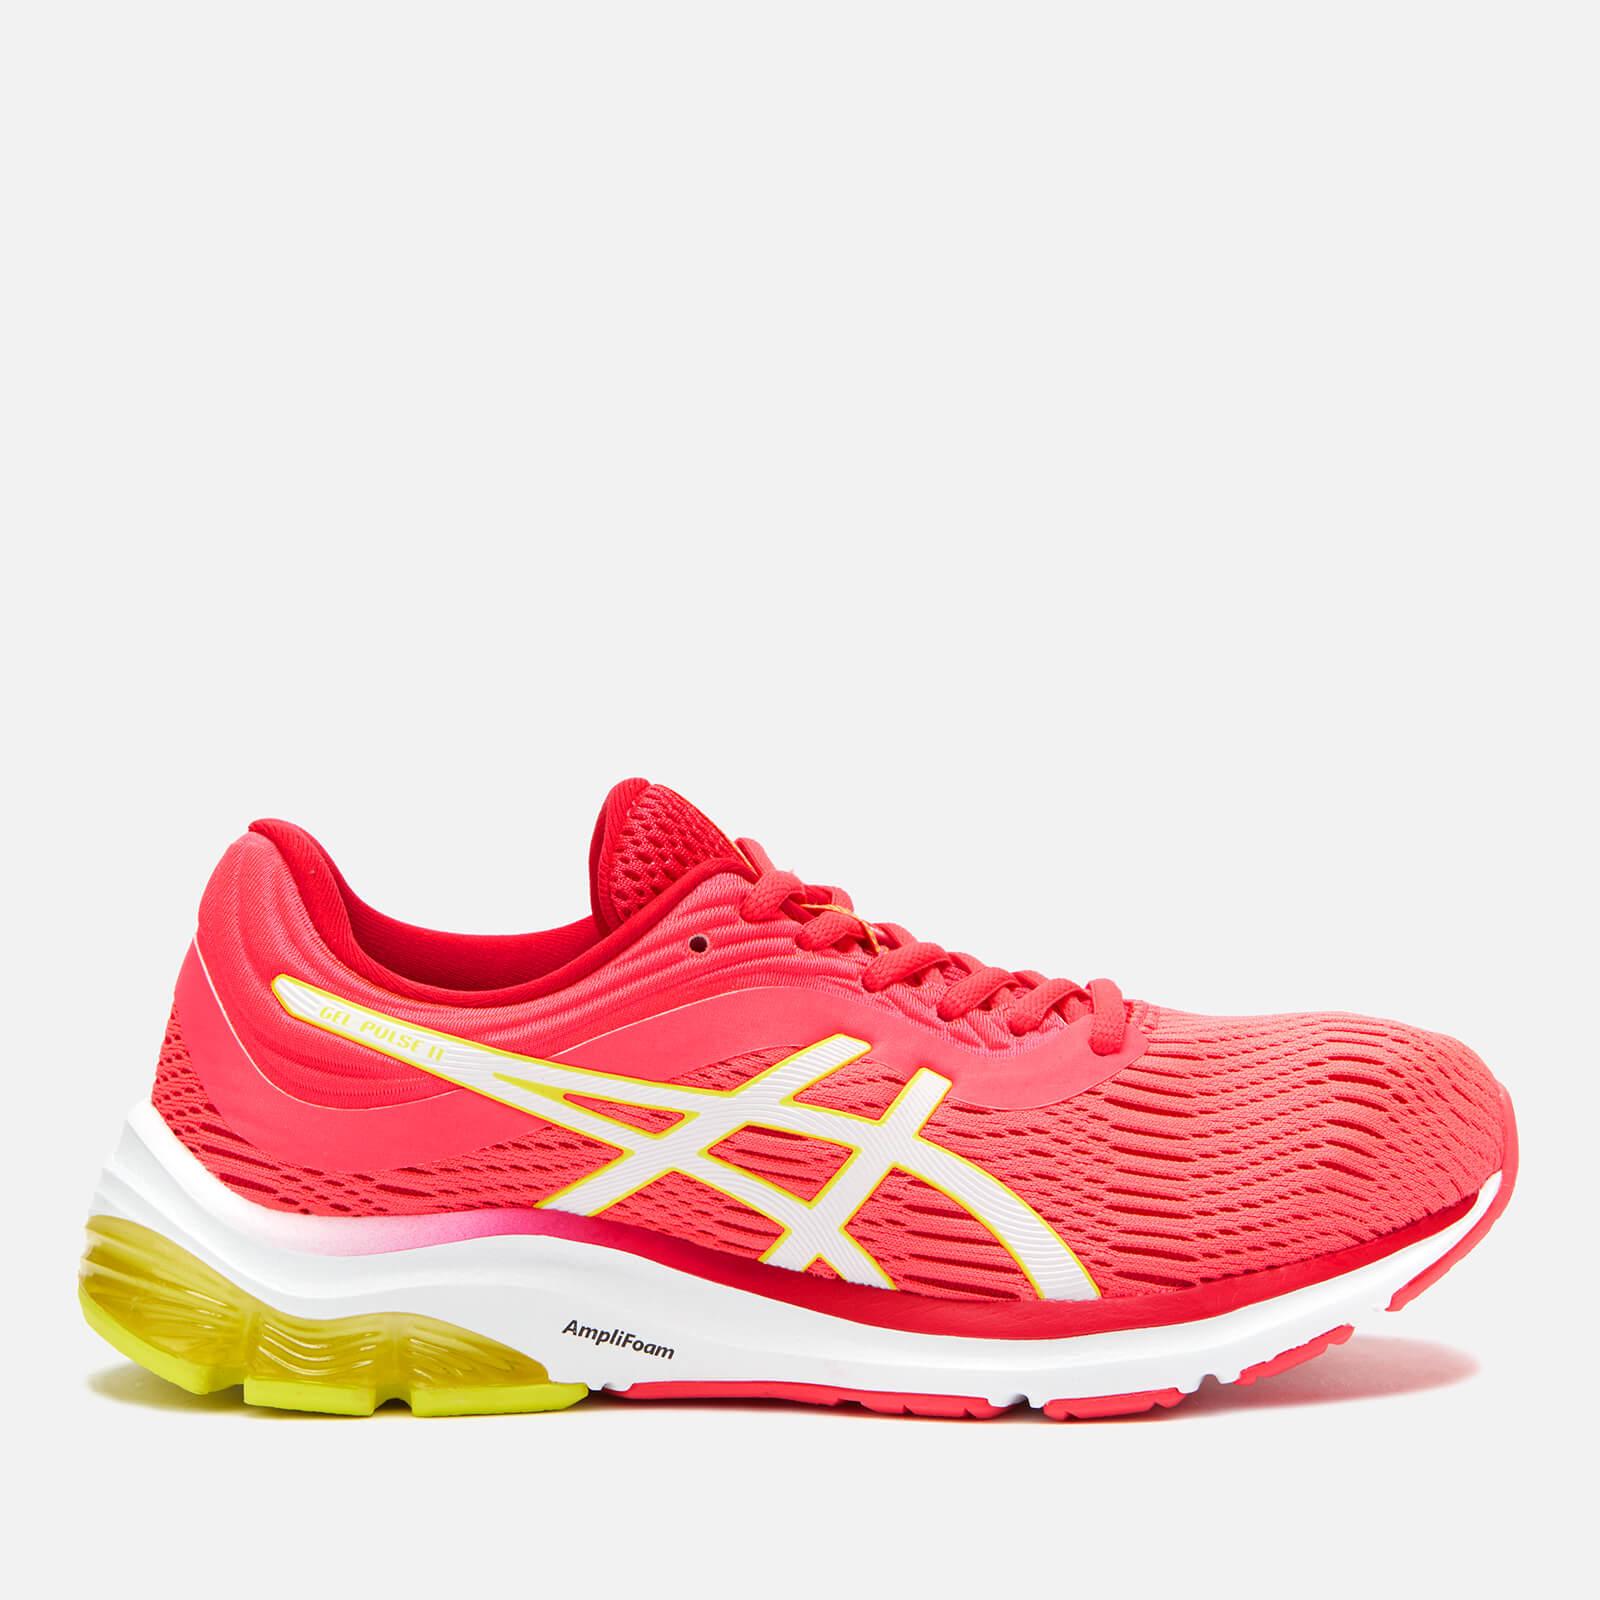 Asics Women's Running Gel-Pulse 11 Trainers - Laser Pink/Sour Yuzu - UK 6 - Pink